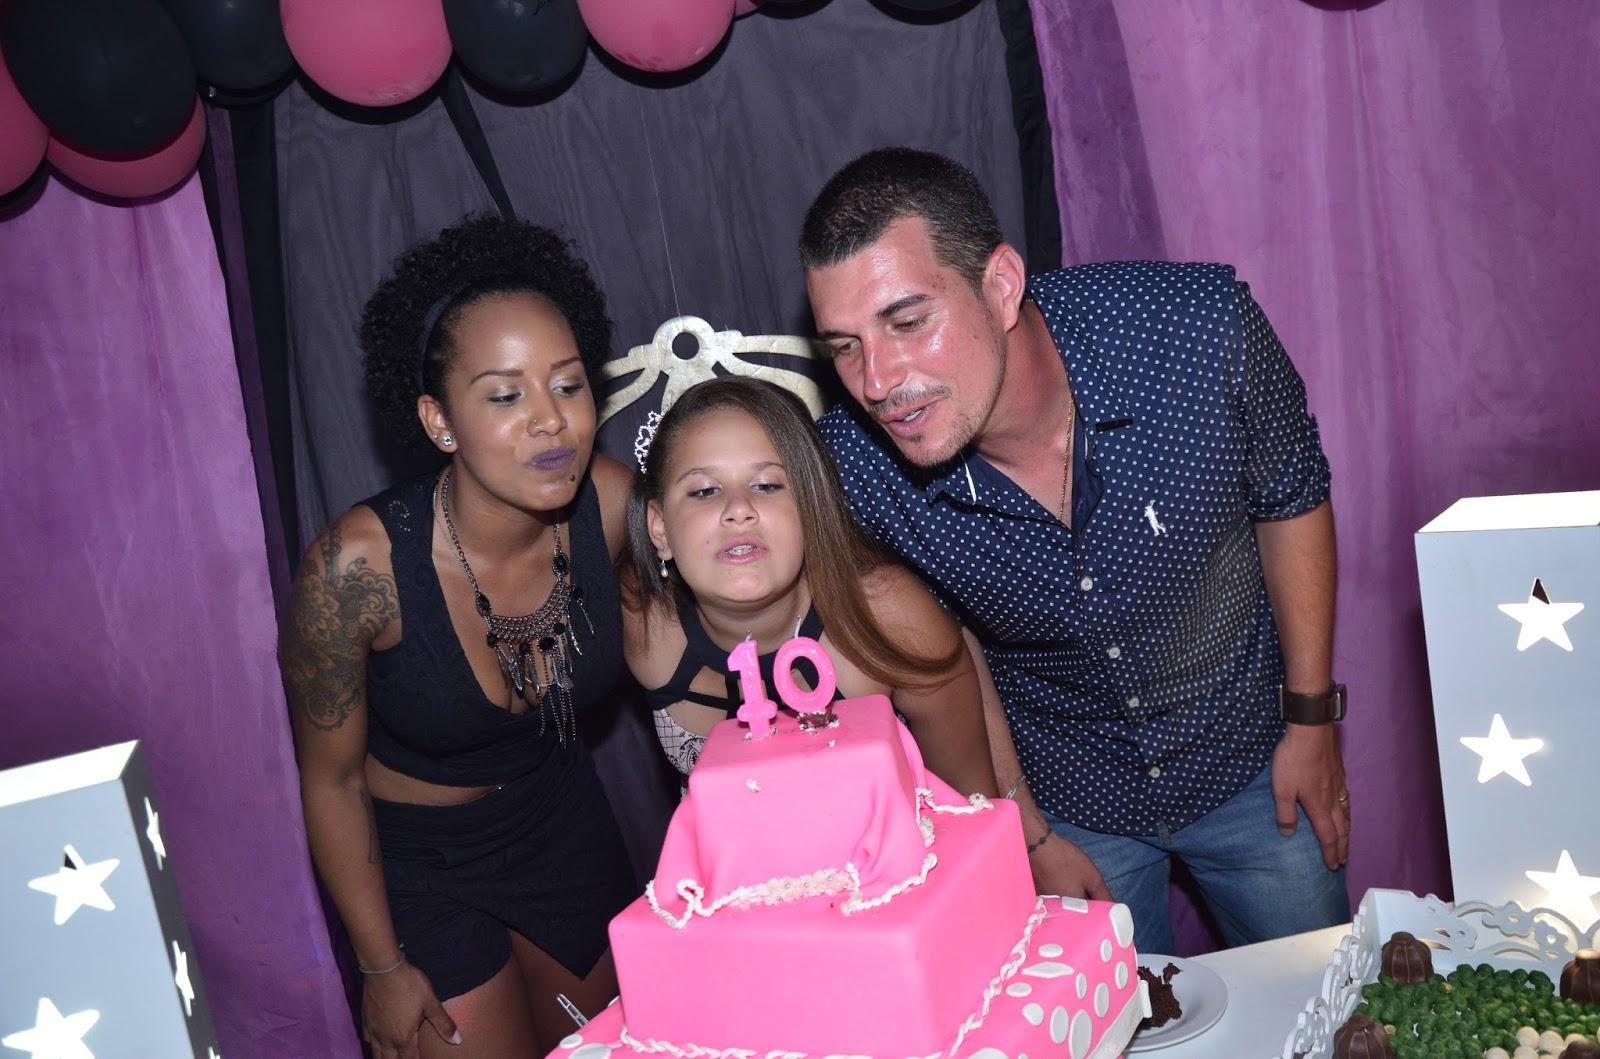 festa princesa, aniversario de 10 anos, fala serio zy, yssa almeida